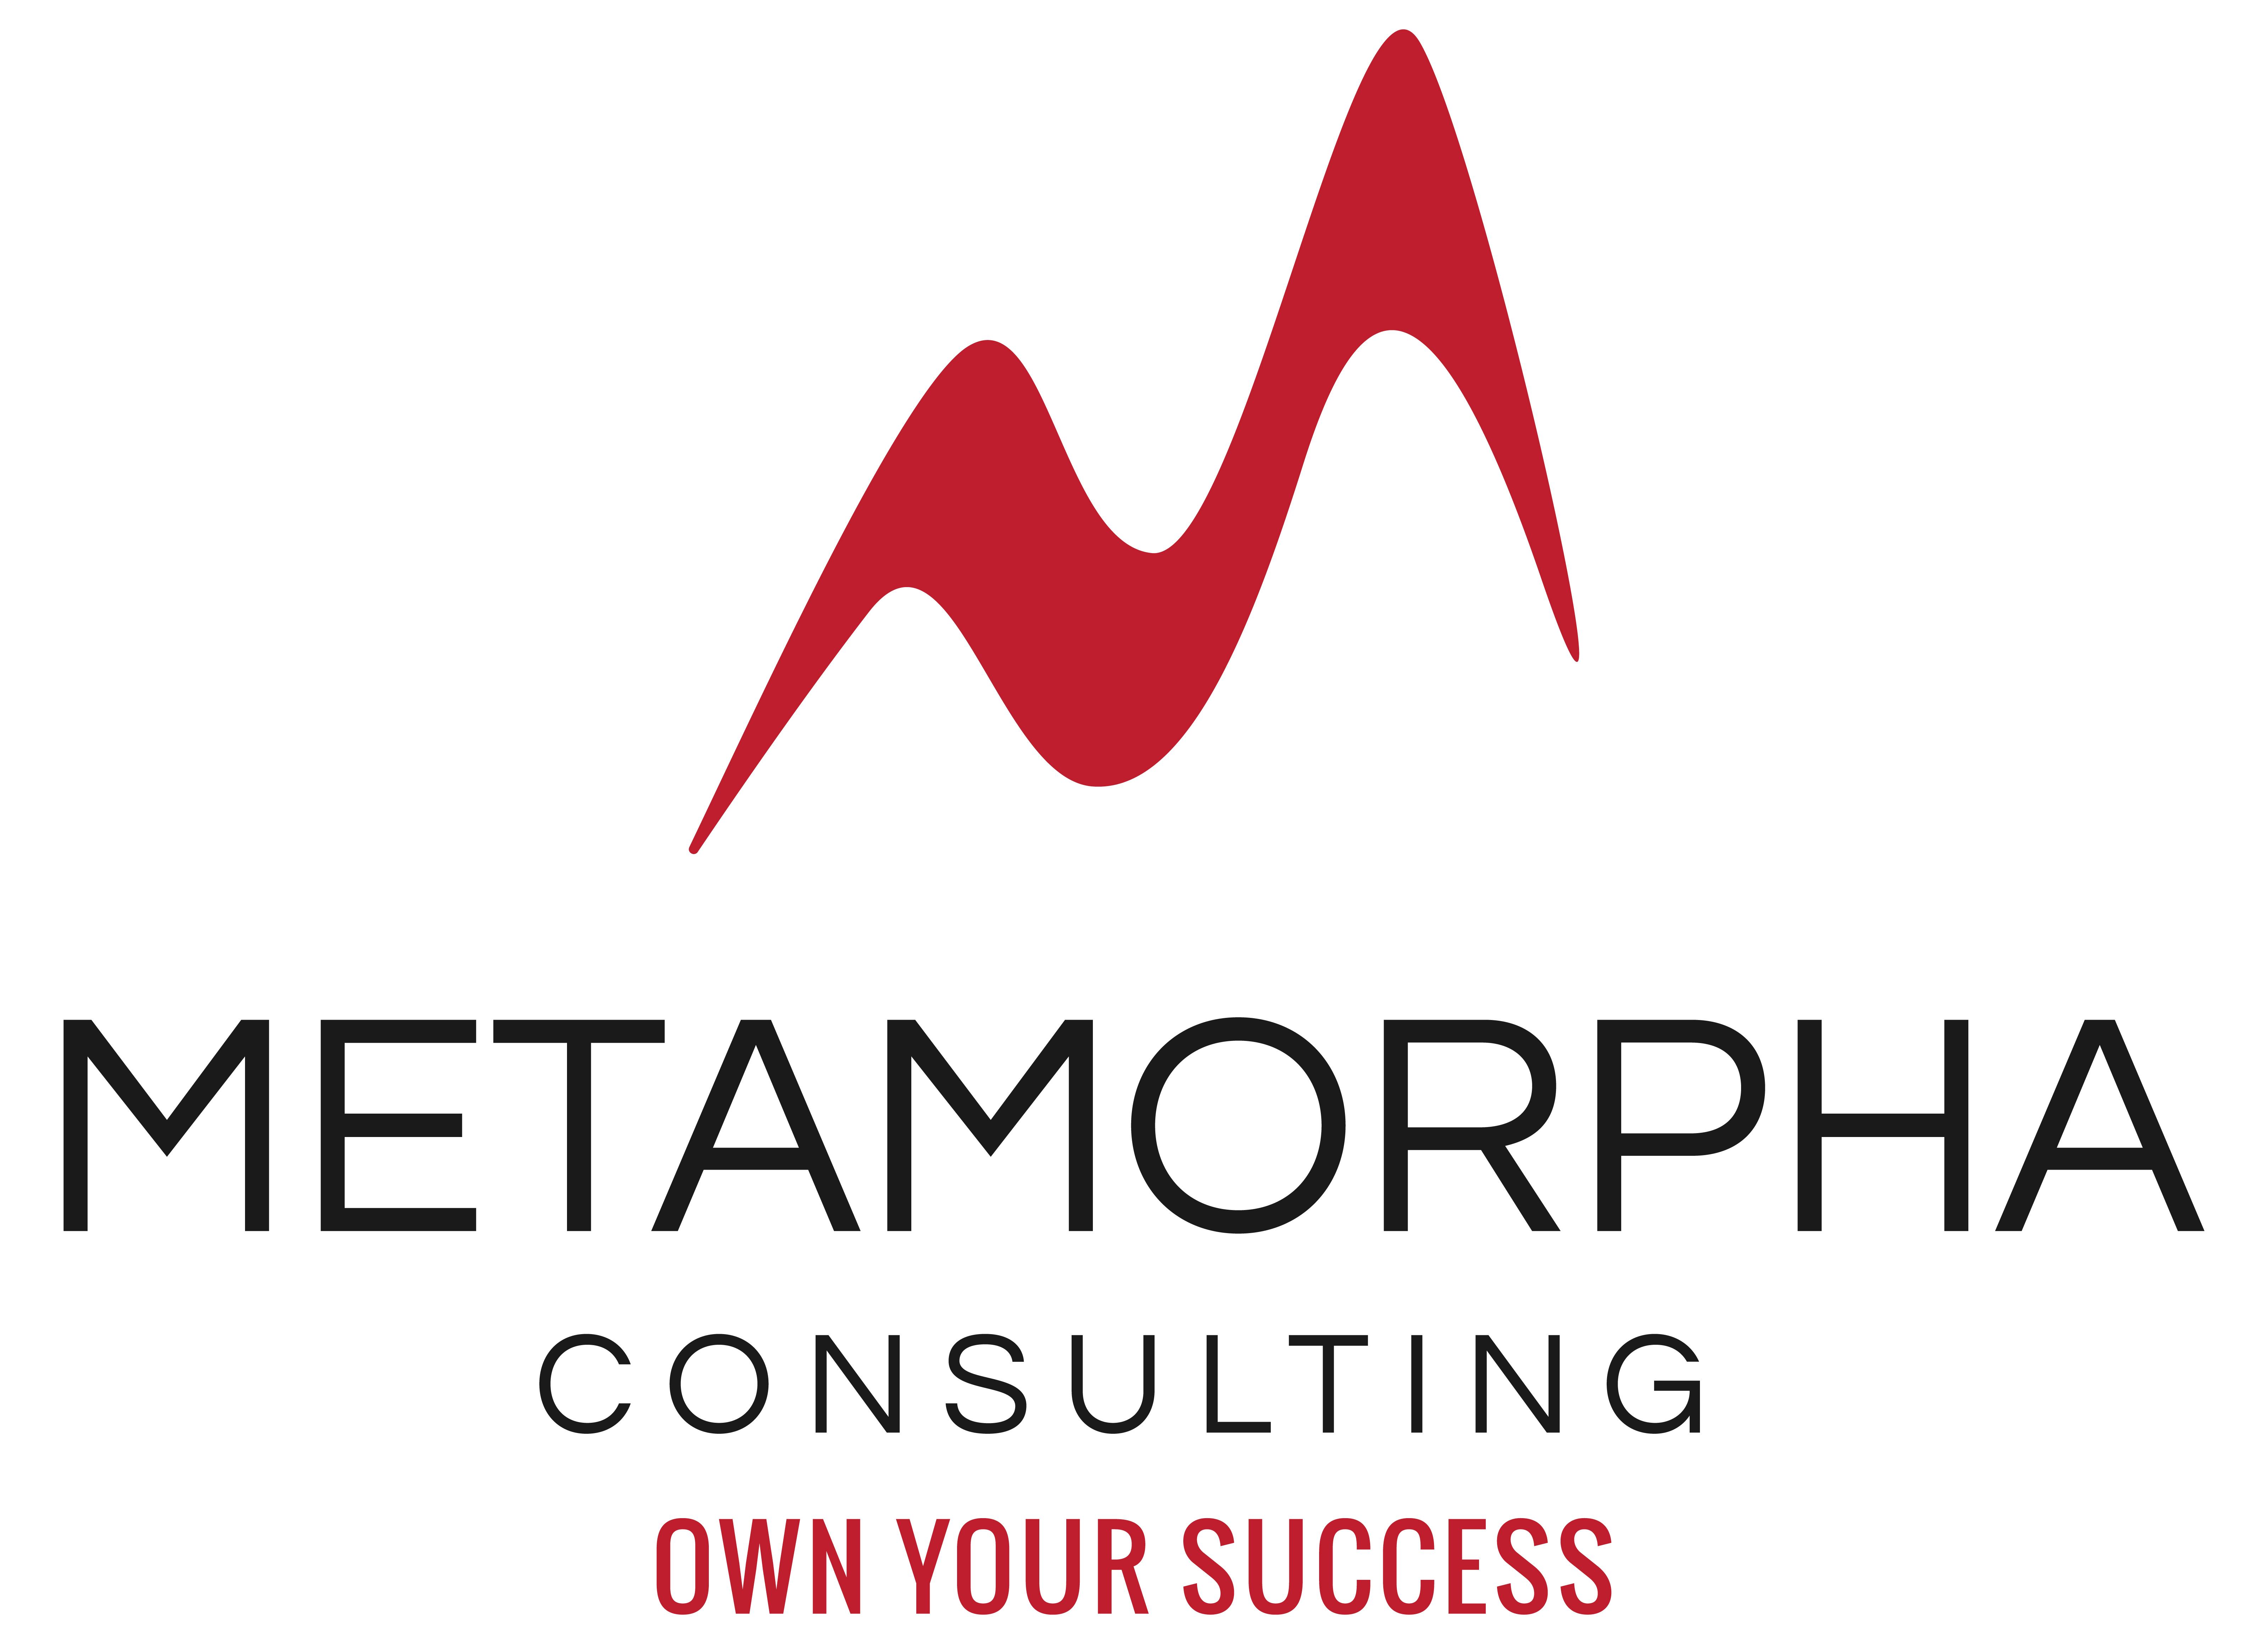 Metamorpha Consulting logo